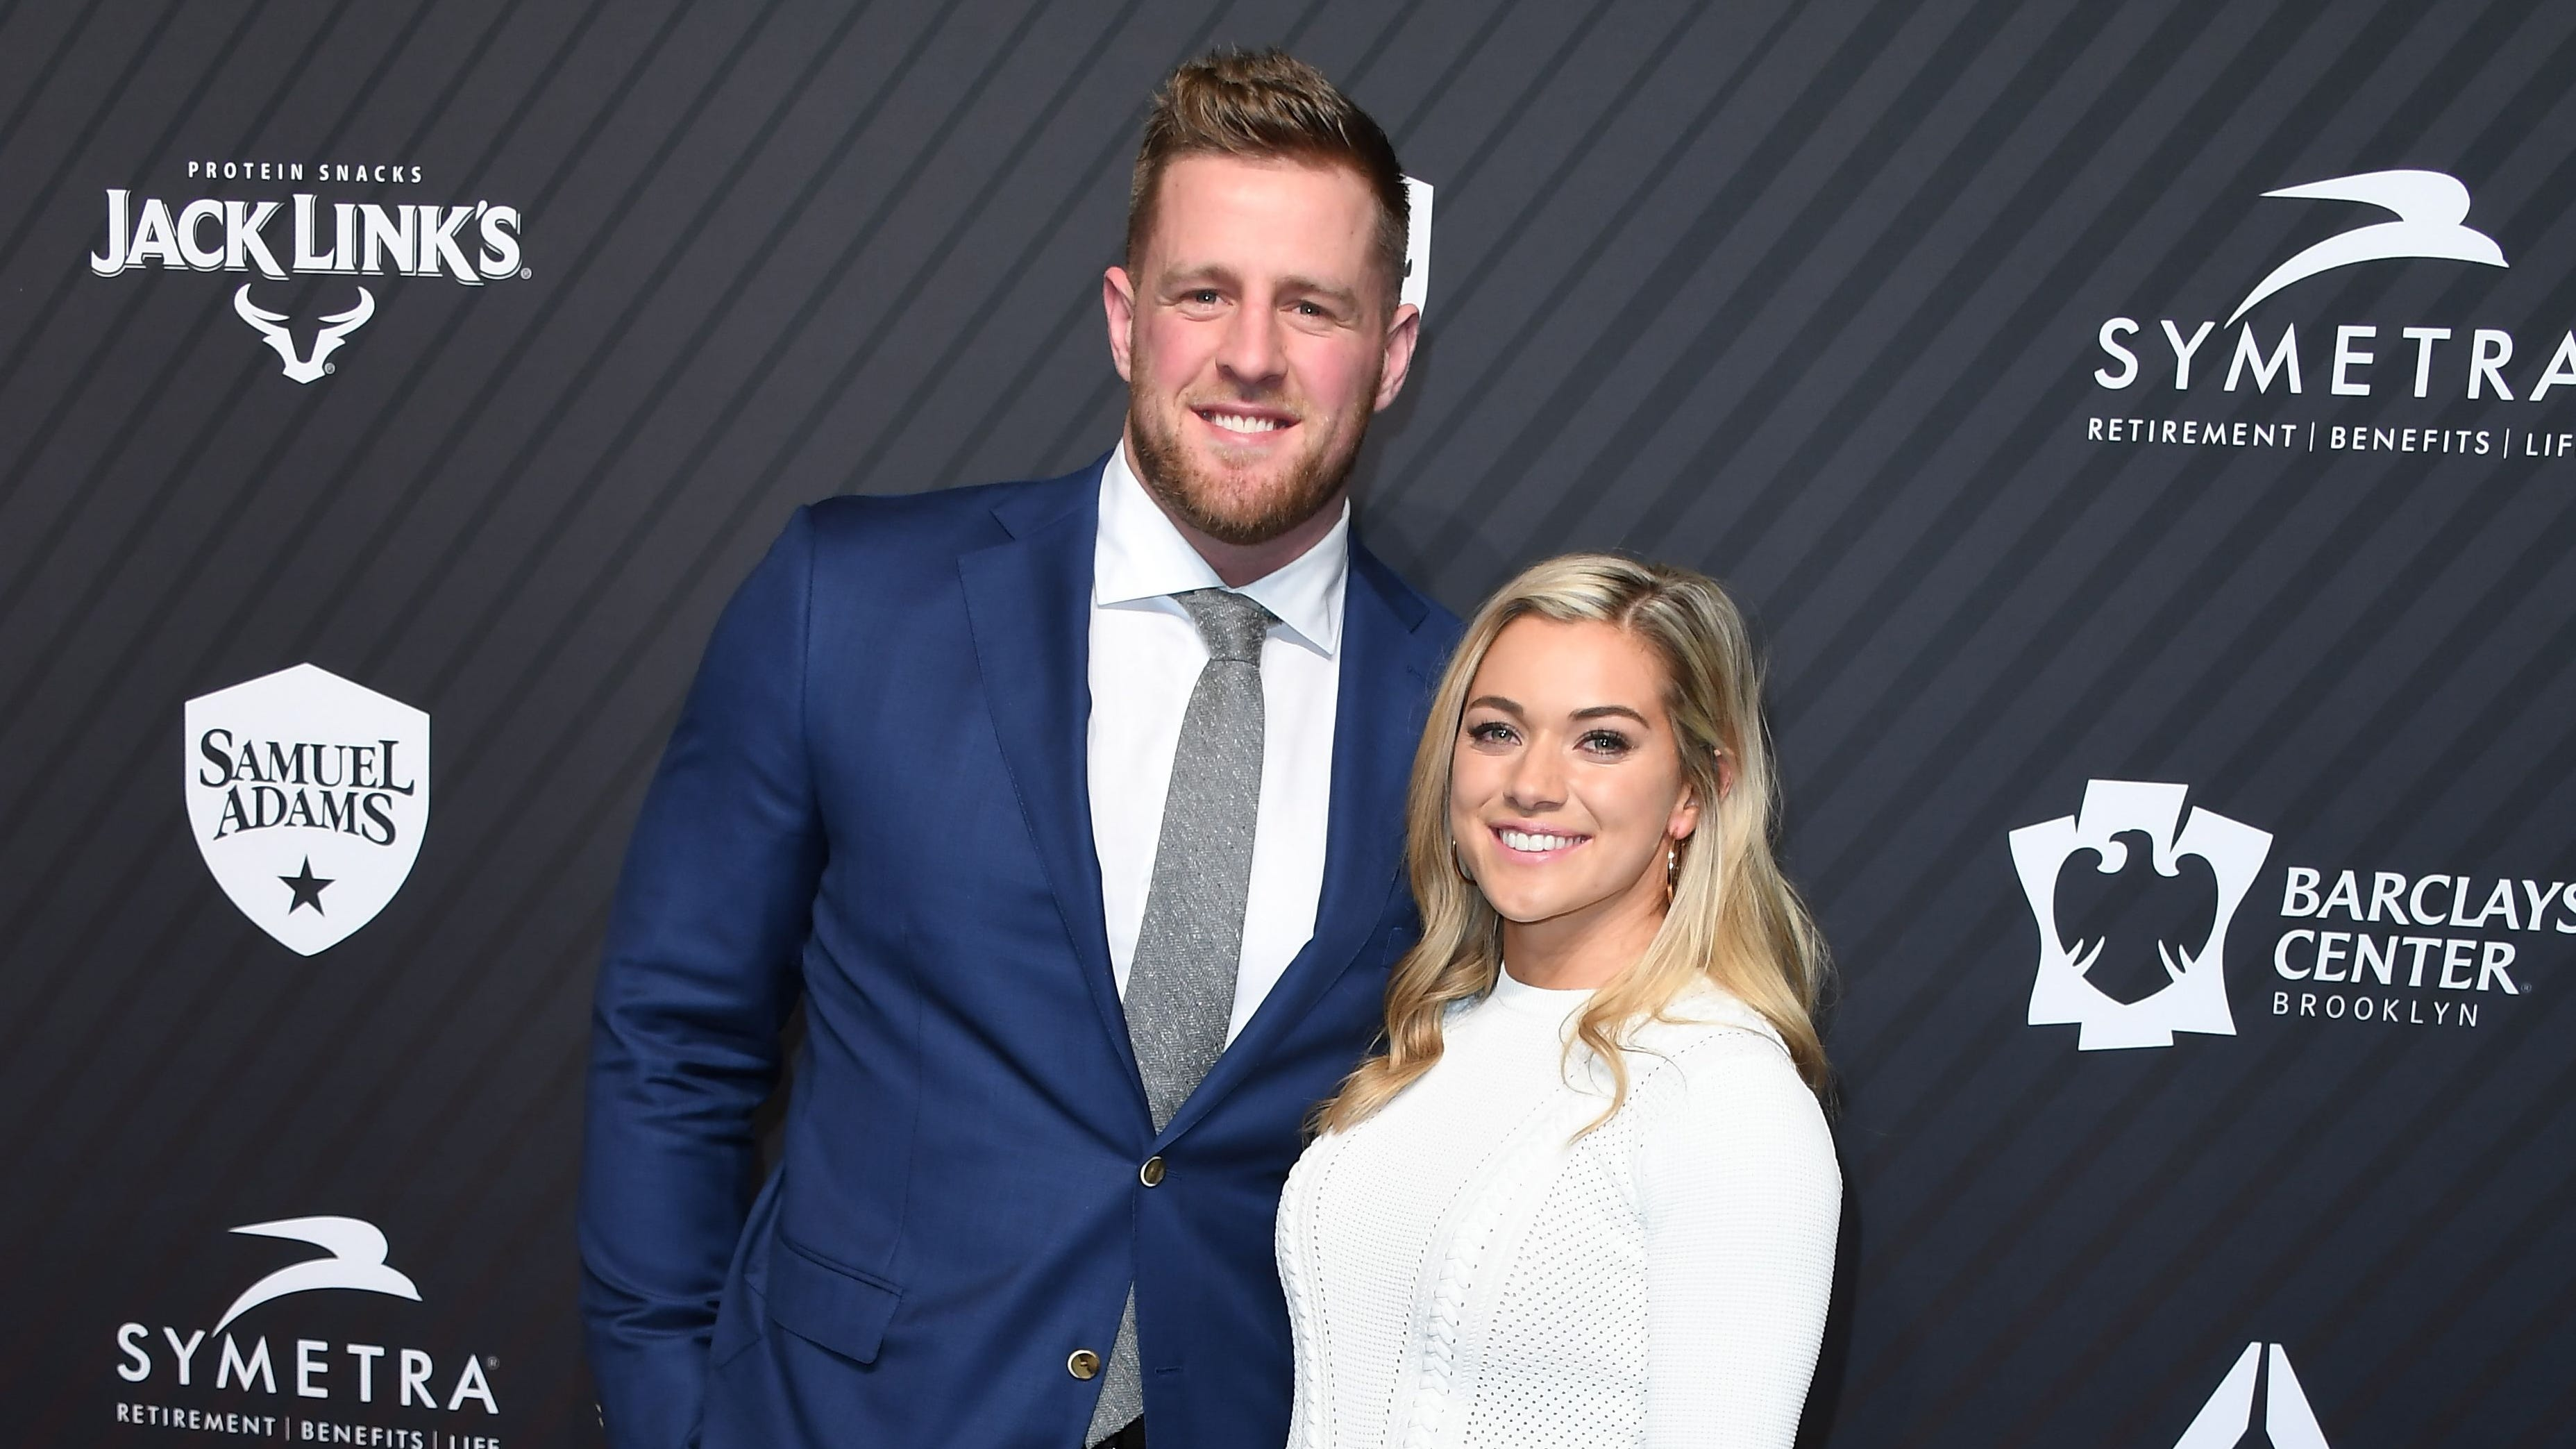 J. J. Watt and his girlfriend Kealia Ohai arrive for the 2017 Sports Illustrated Sportsperson of the Year Award Show.